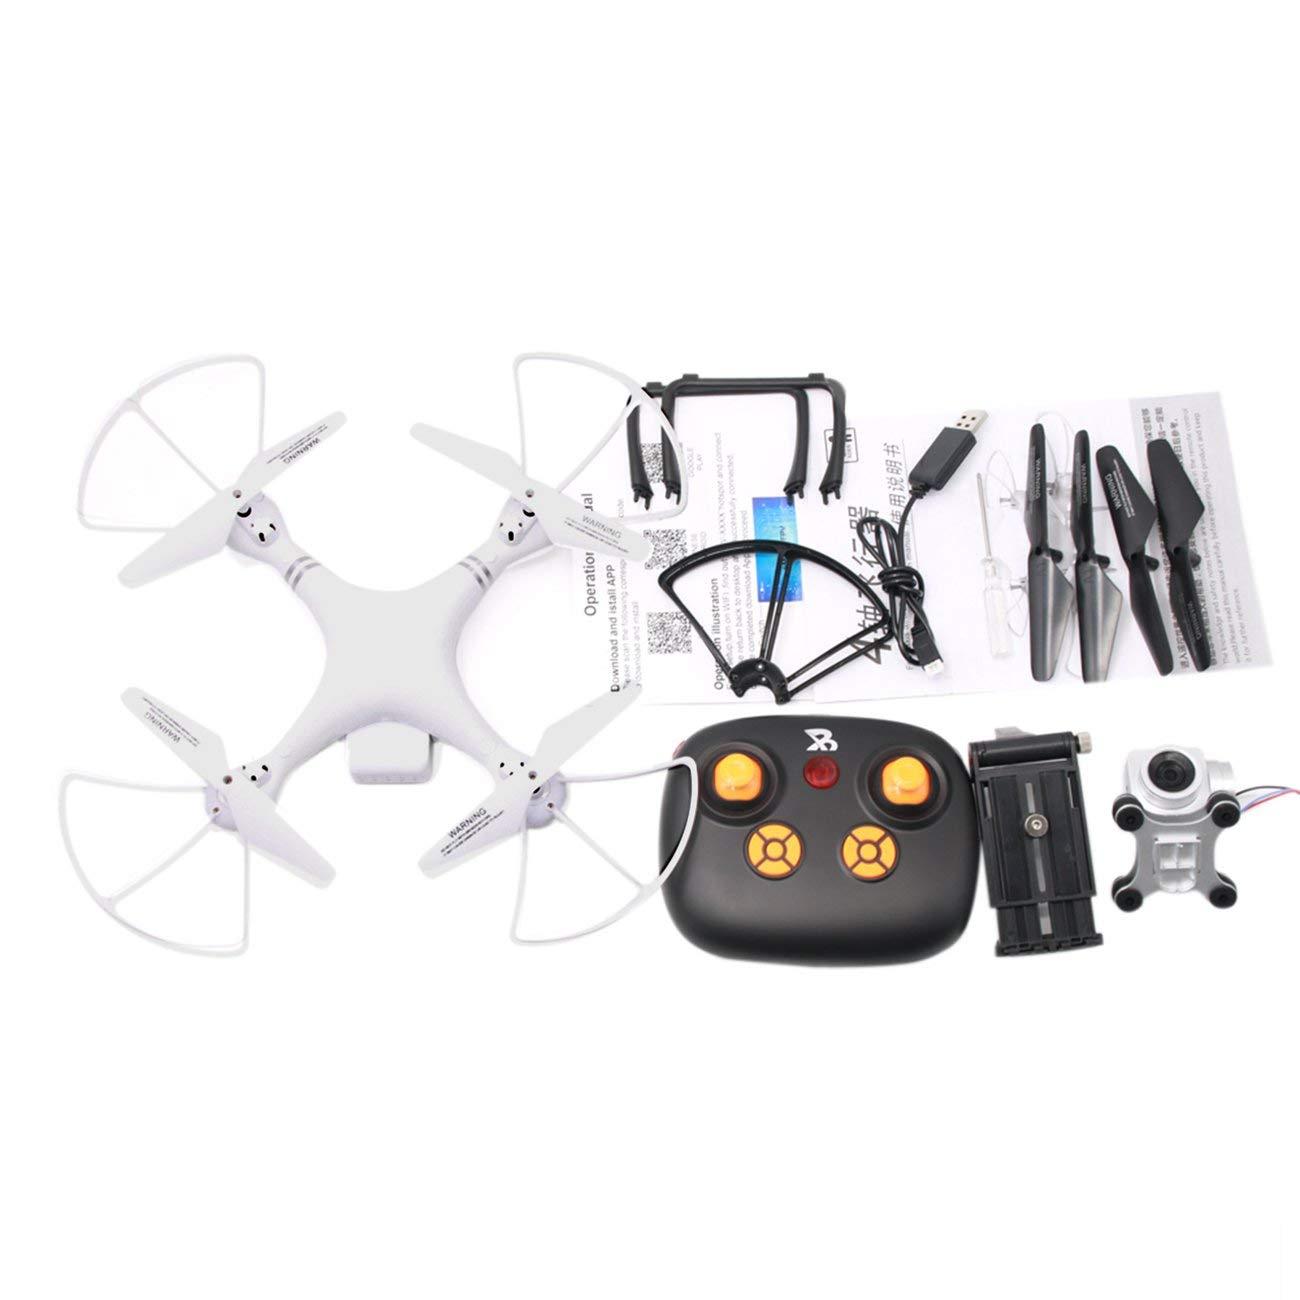 A806 Vierachsige Drohne Mini Fliegende Flugzeuge Quadcopter 2 Megapixel Helikopter